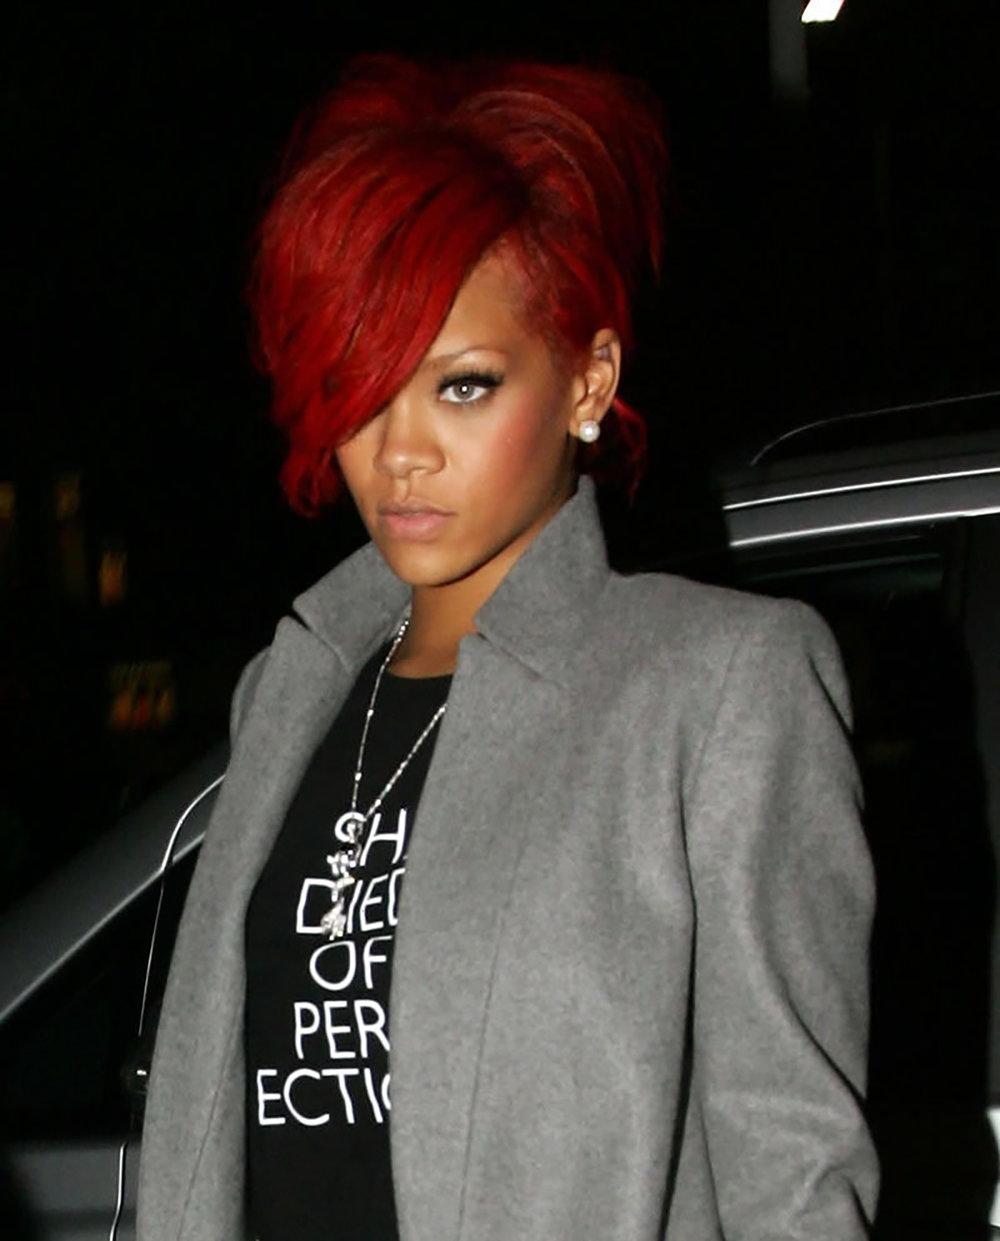 SDOB-fashion-erin-oconner-tshirt-Rihanna-graphics-james-lee-duffy.jpg